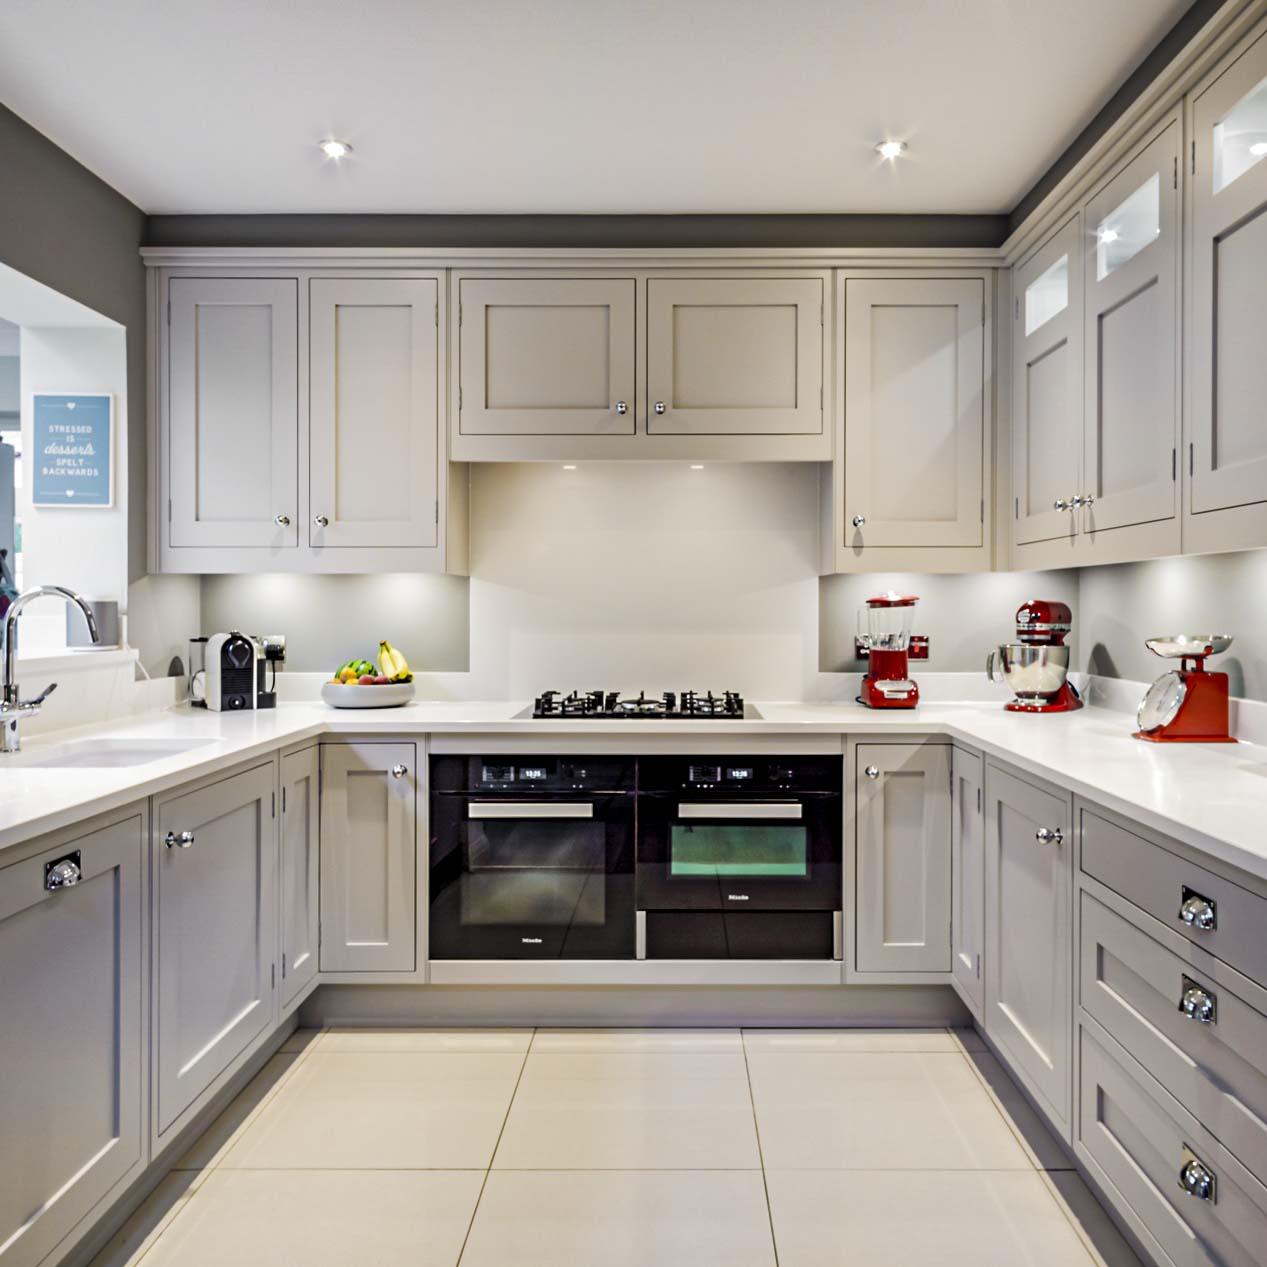 Affordable white quartz worktops Tunbridge Wells Kent HKS Haywards Heath 200612 131936sq